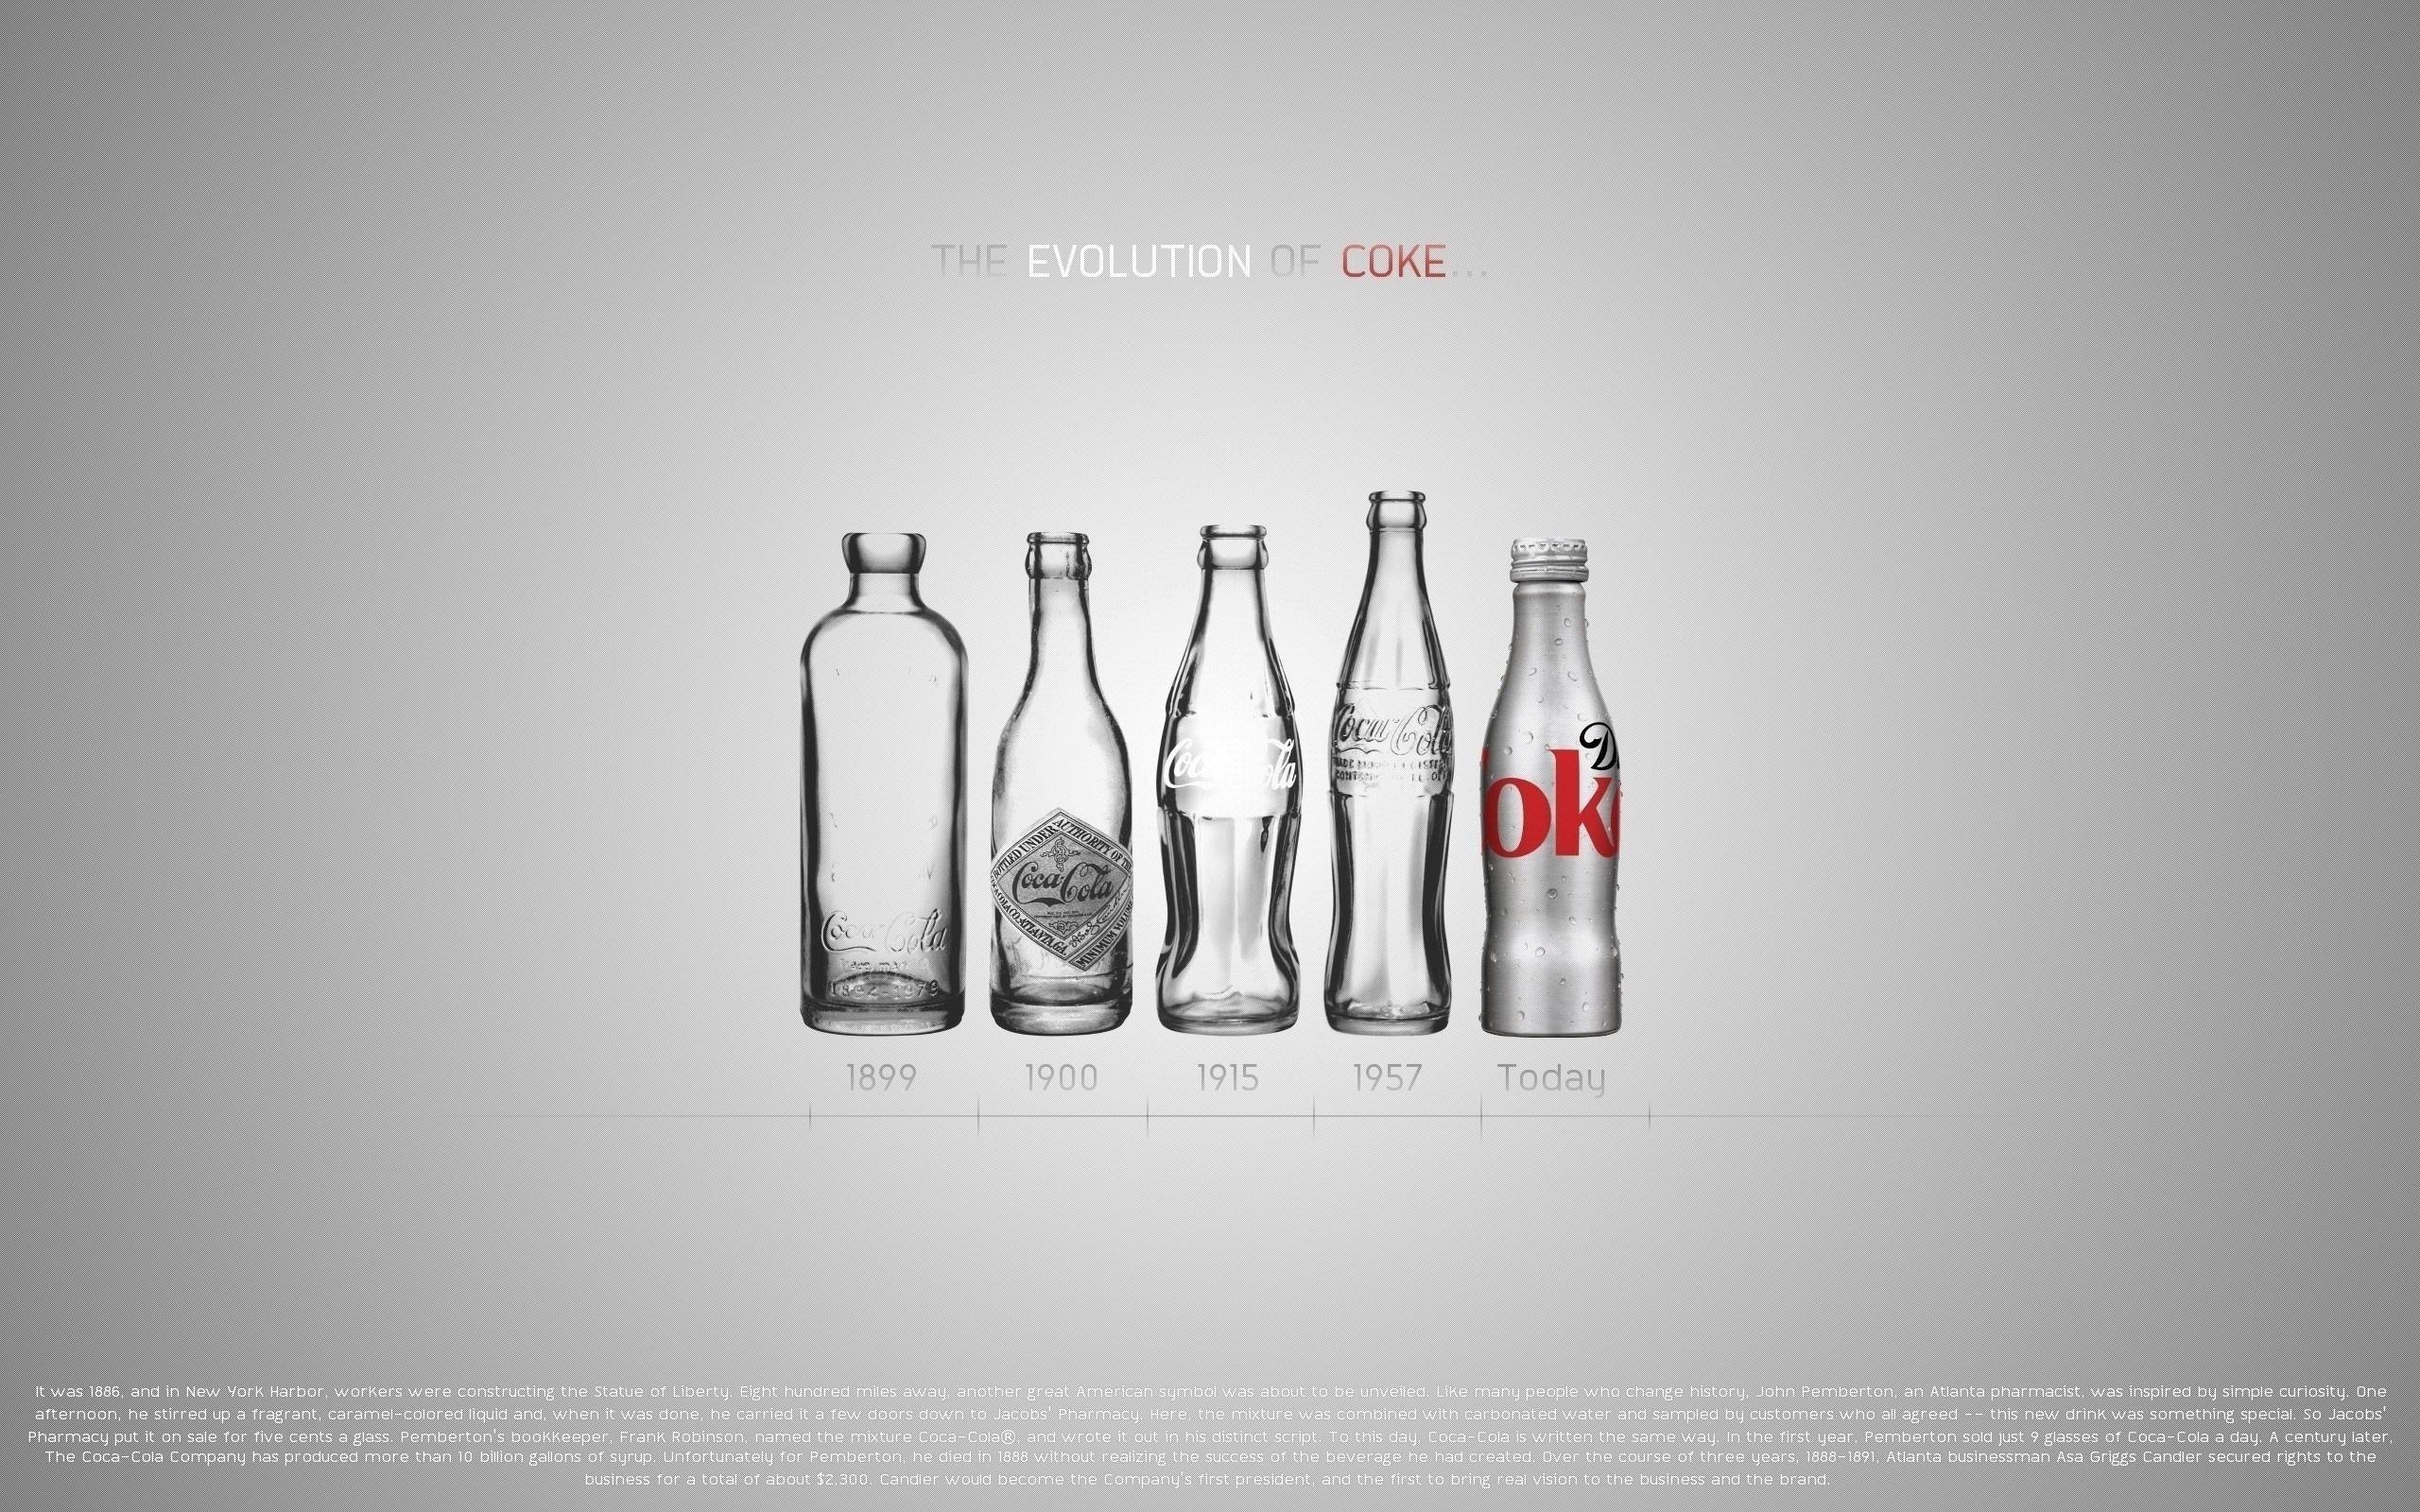 coca cola coke bottles evolution desktop wallpaper